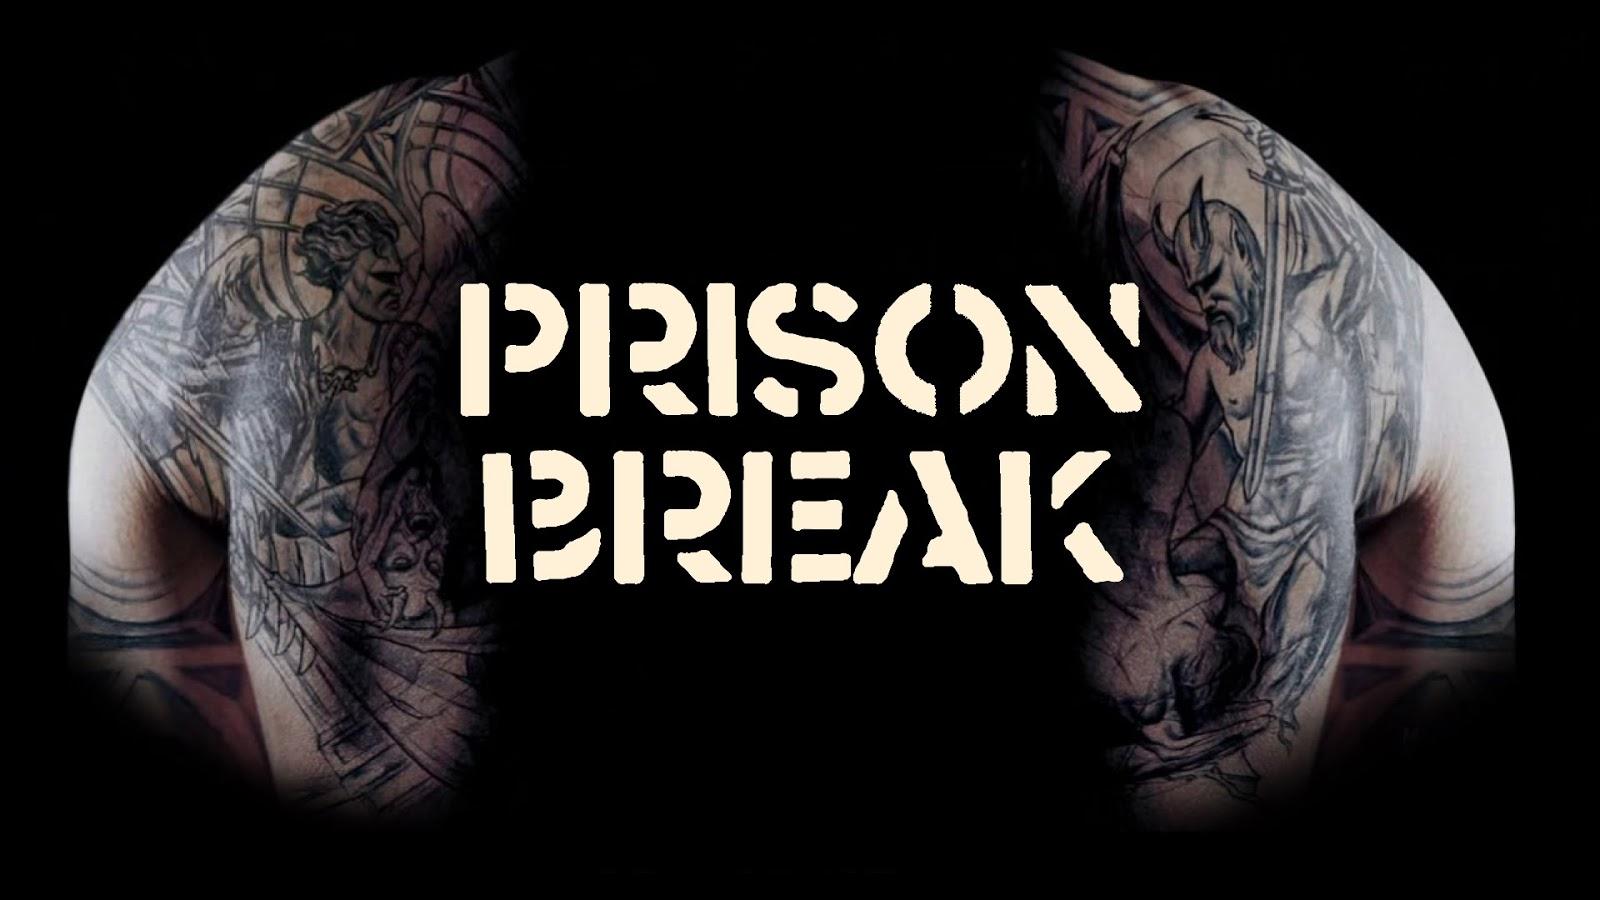 musica de abertura de prison break